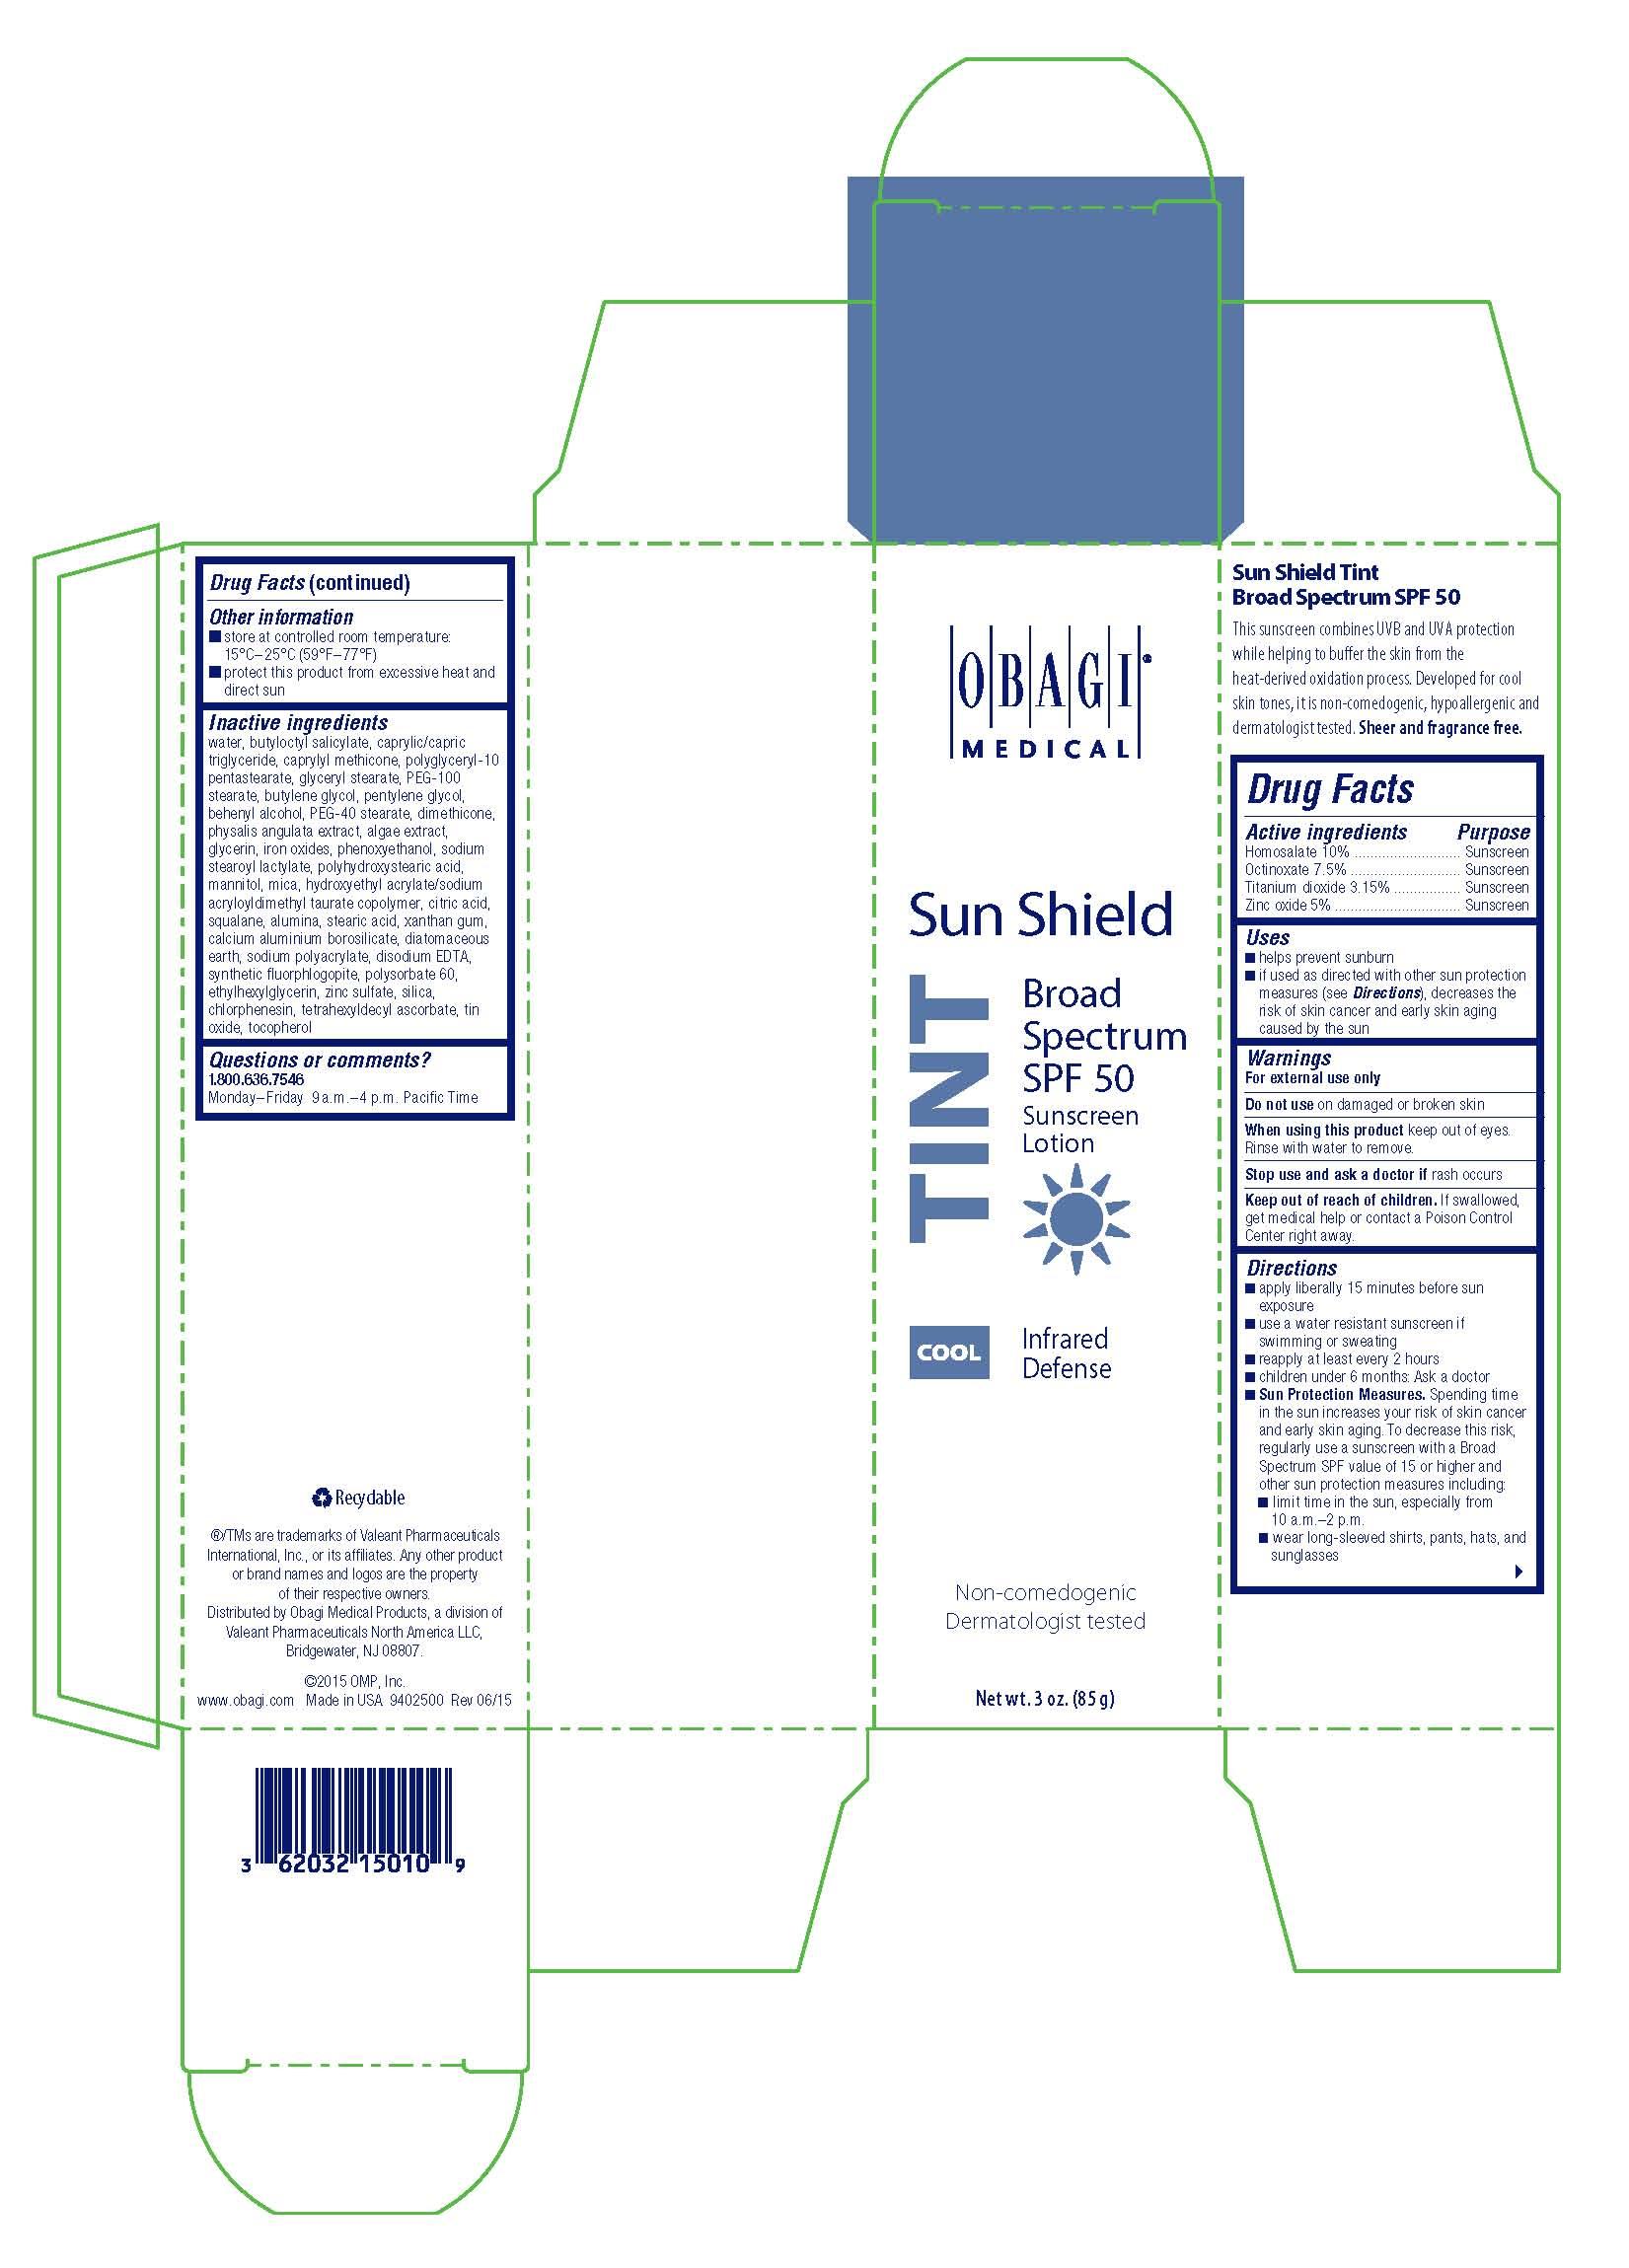 Obagi Sun Shield TINT Cool Sunscreen Broad Spectrum SPF 50 Carton